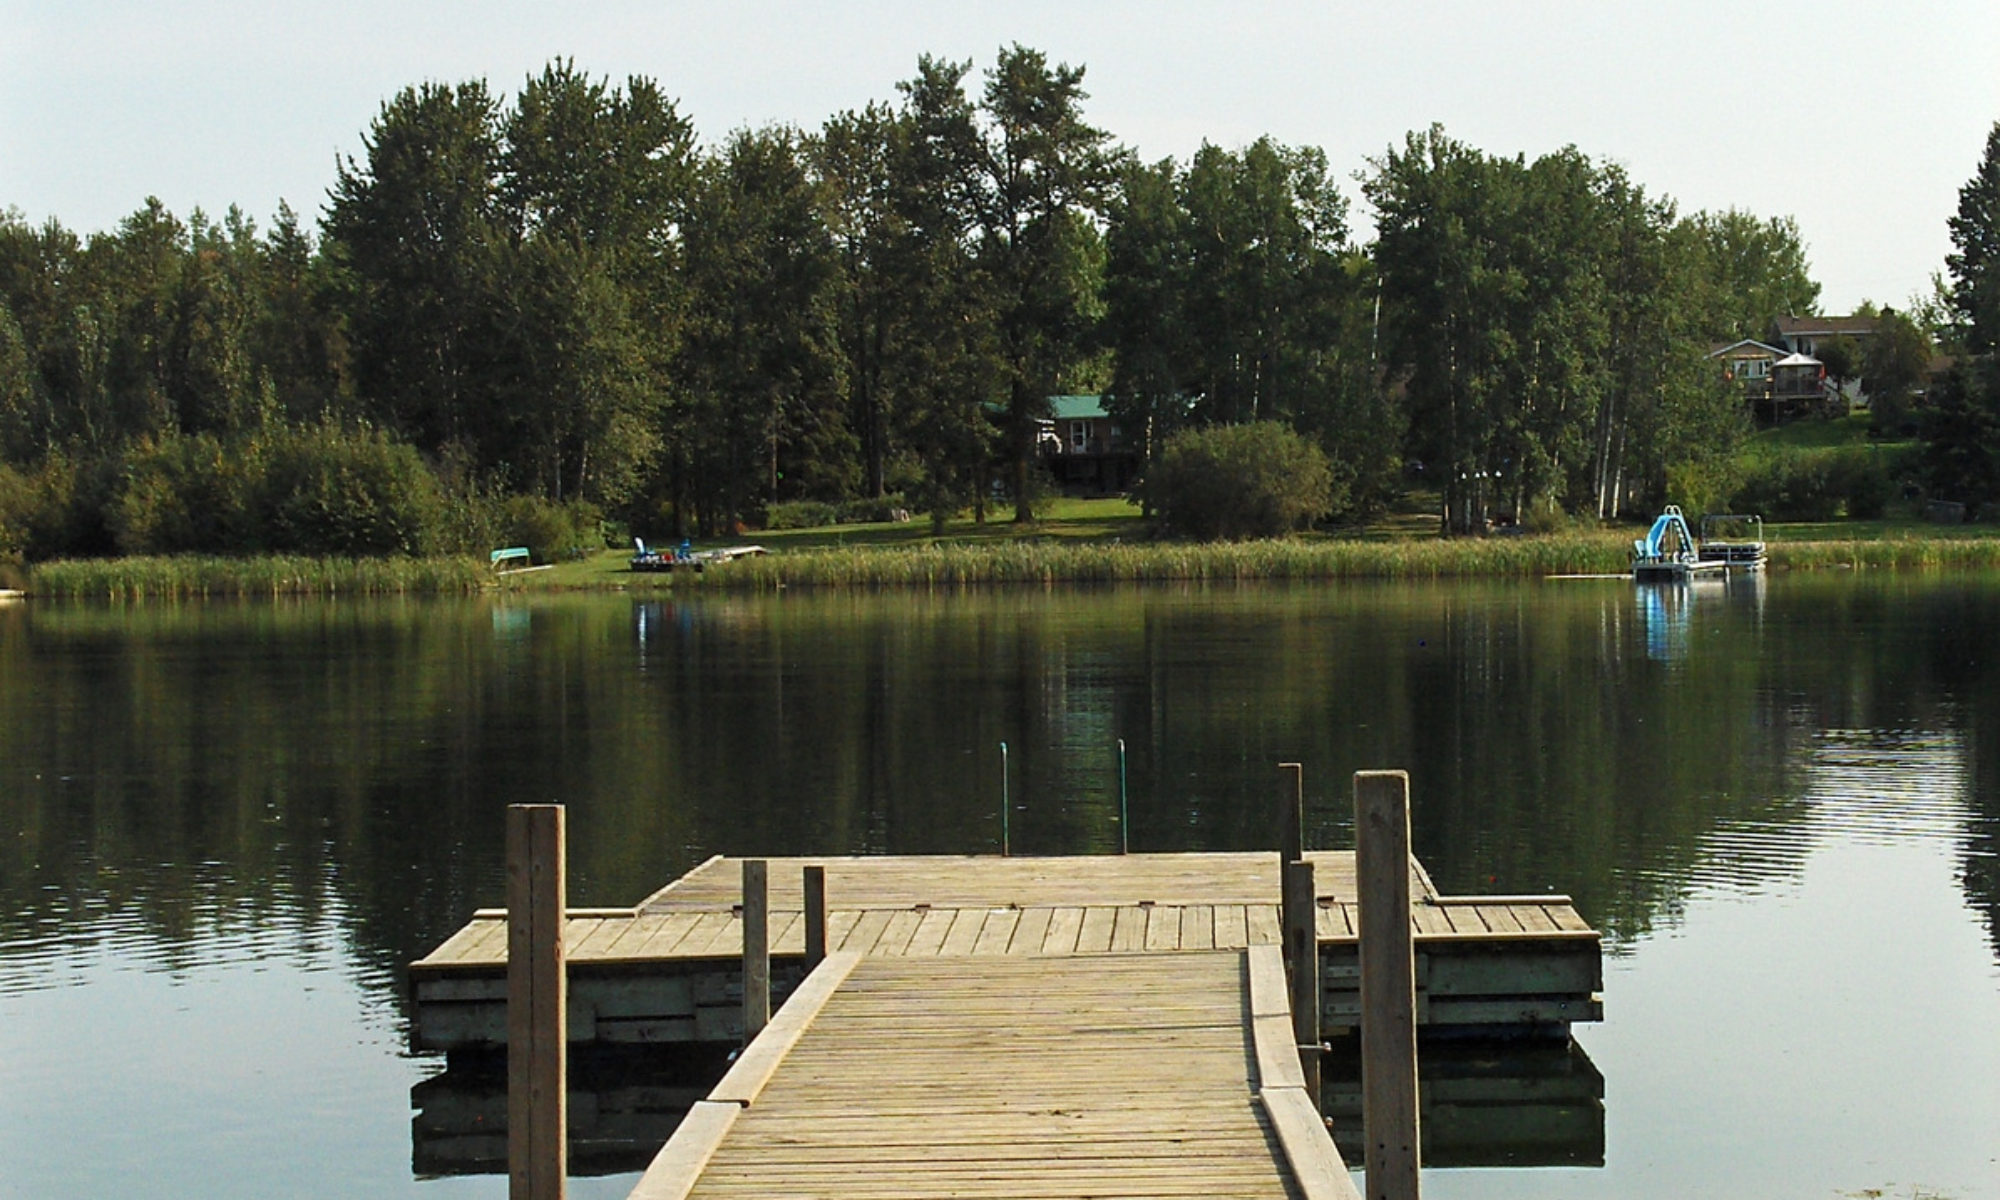 Hubbles Lake Resort